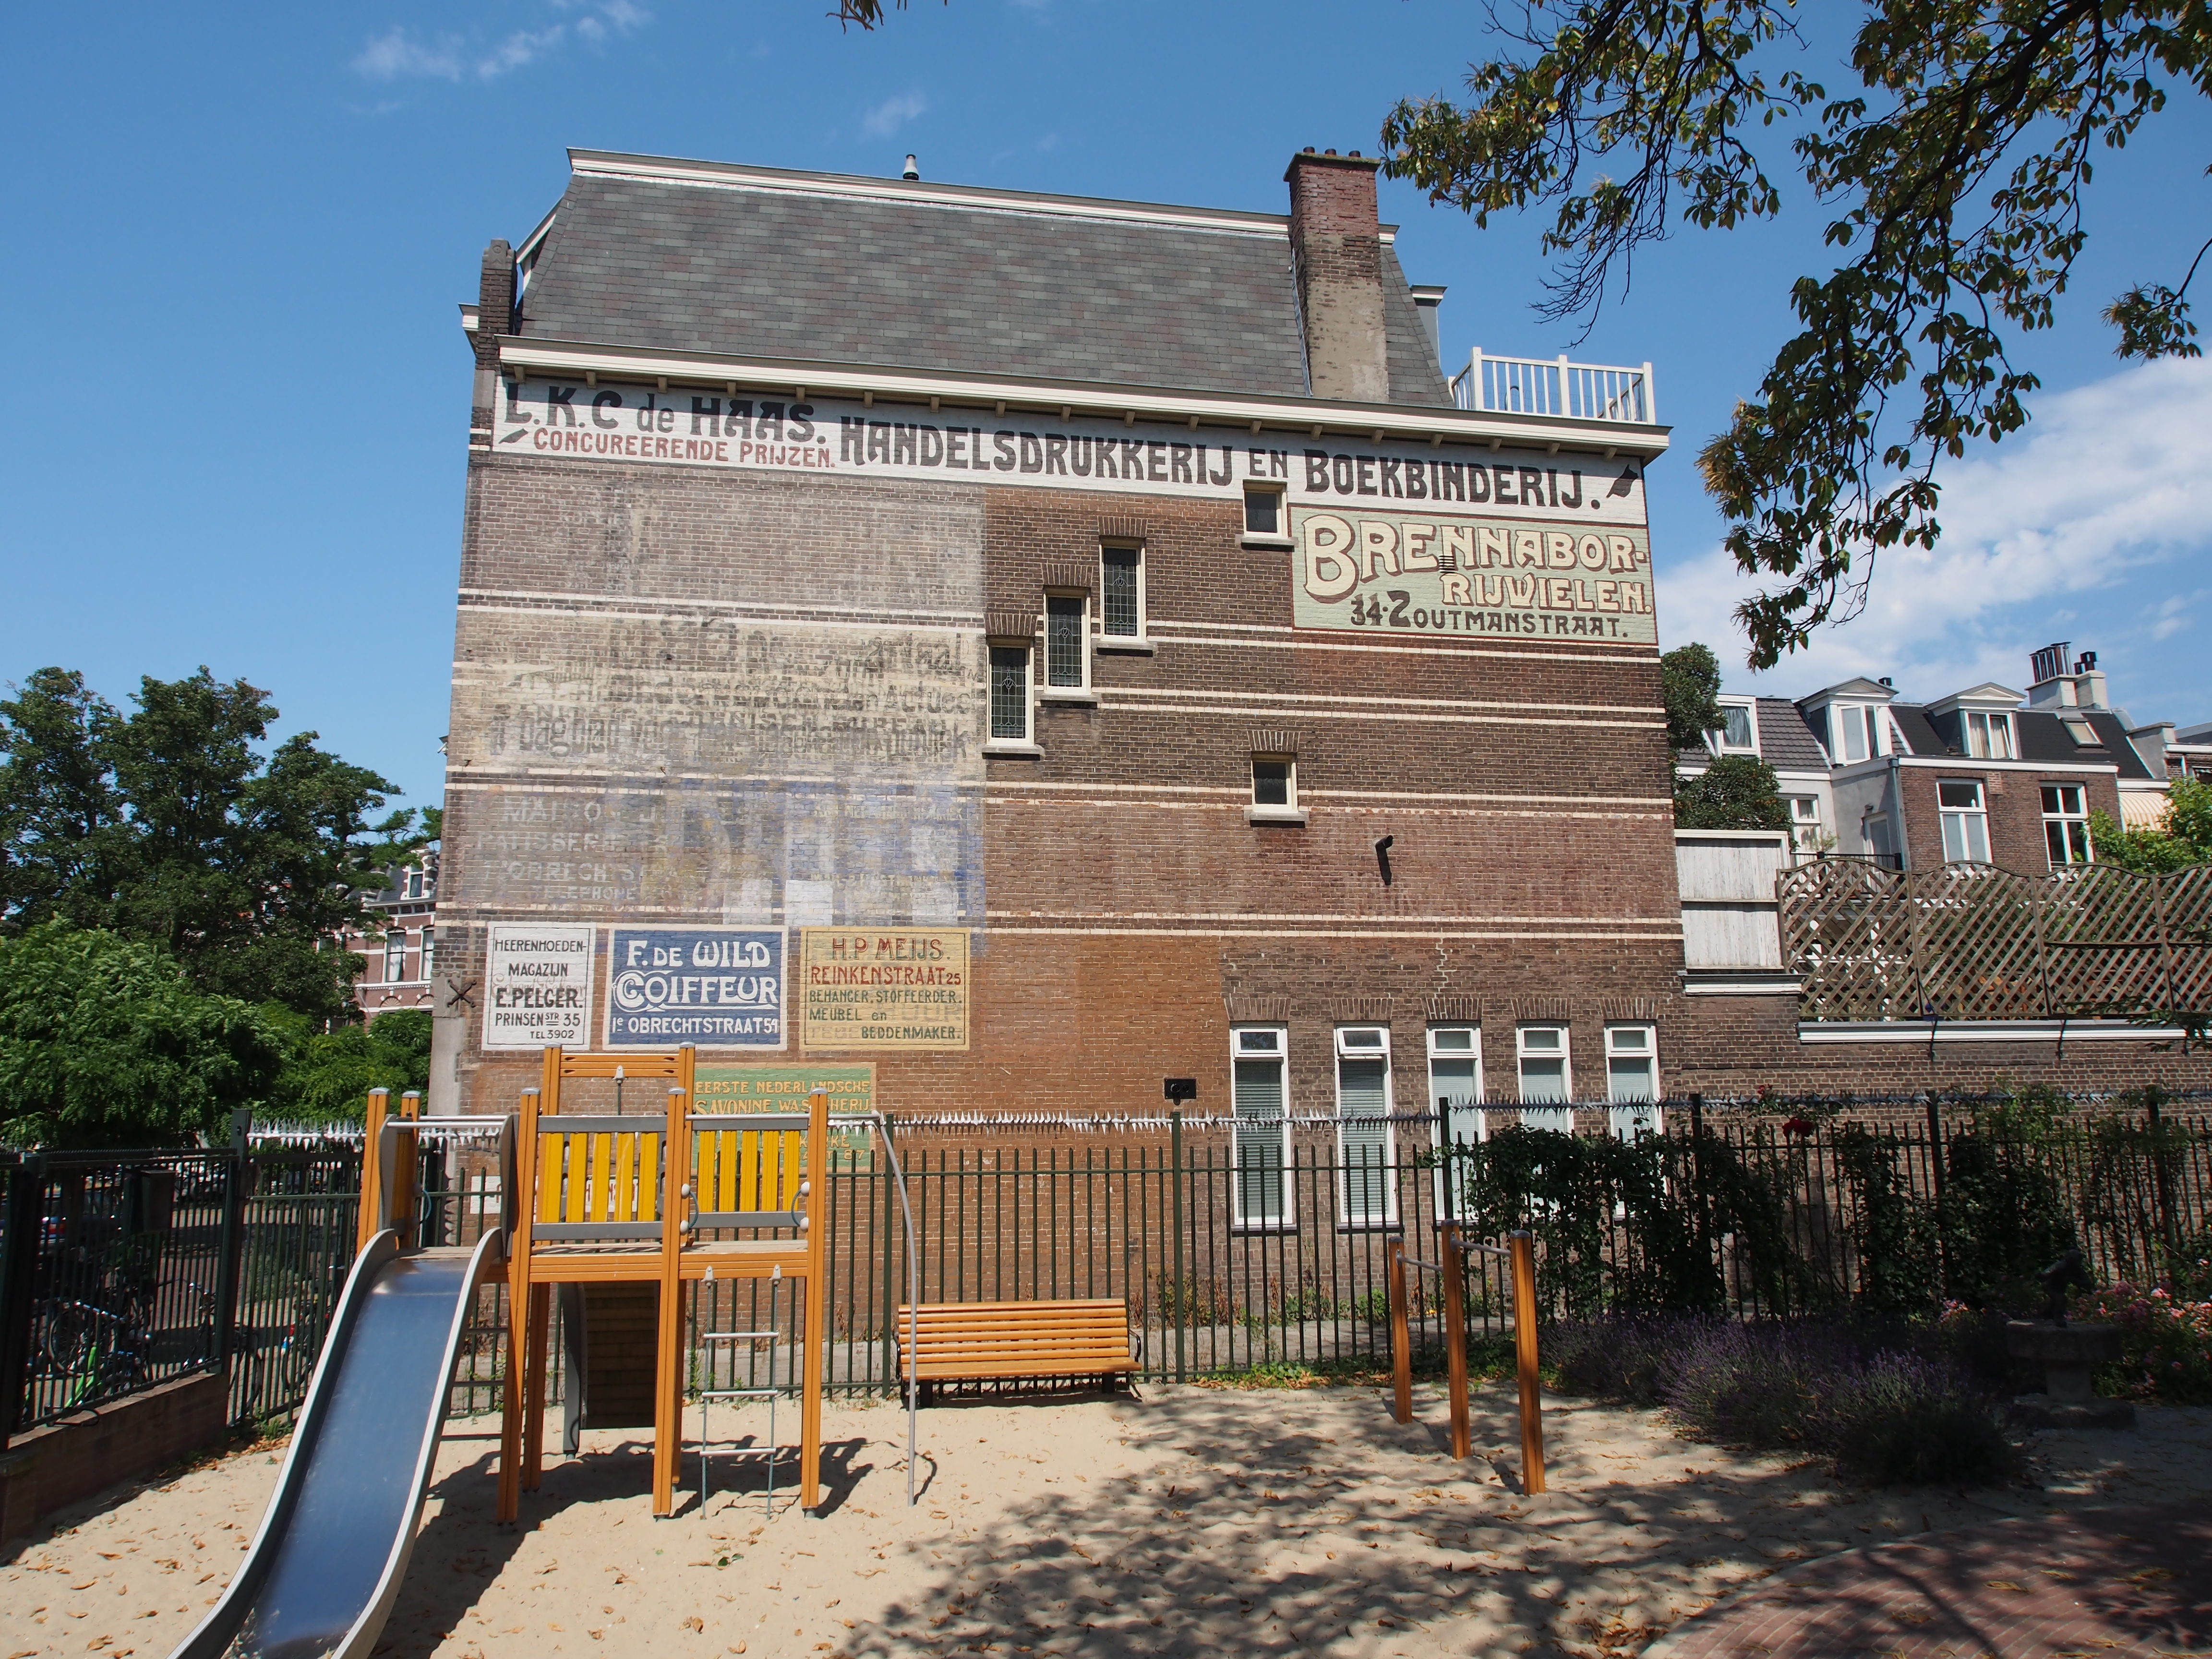 Meubel Den Haag : File tasmanstraat den haag pic g wikimedia commons